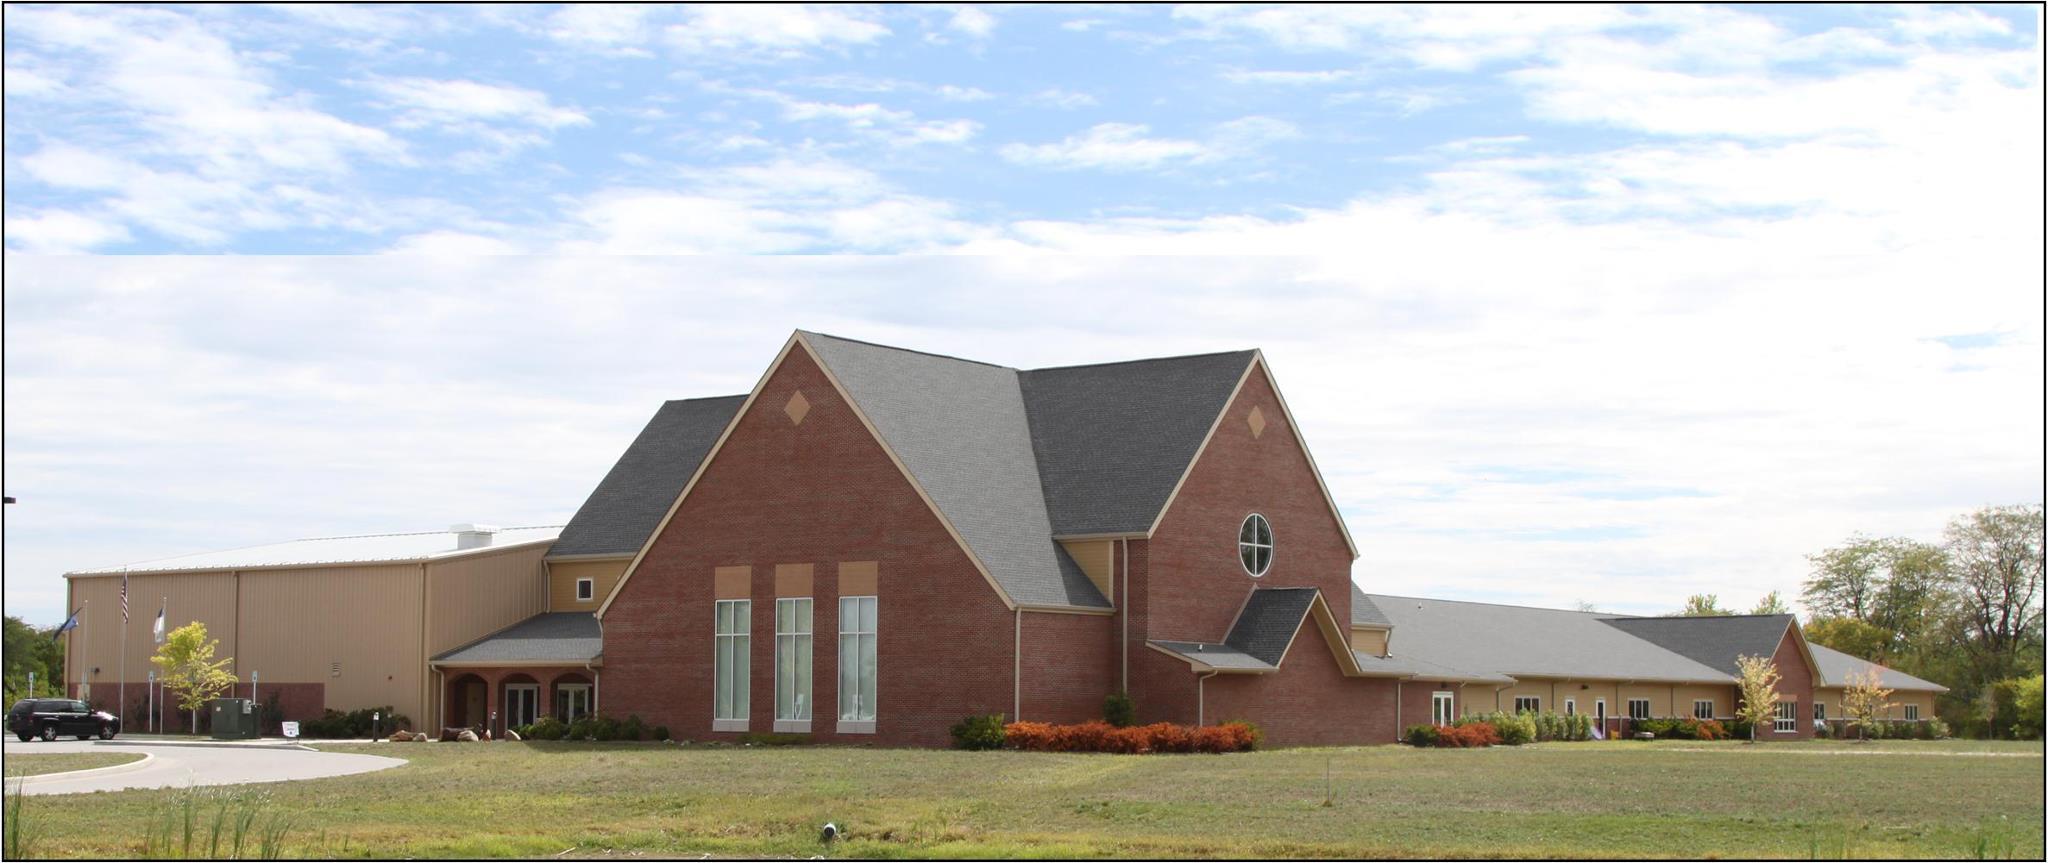 Our Shepherd Lutheran Church & School Food Pantry